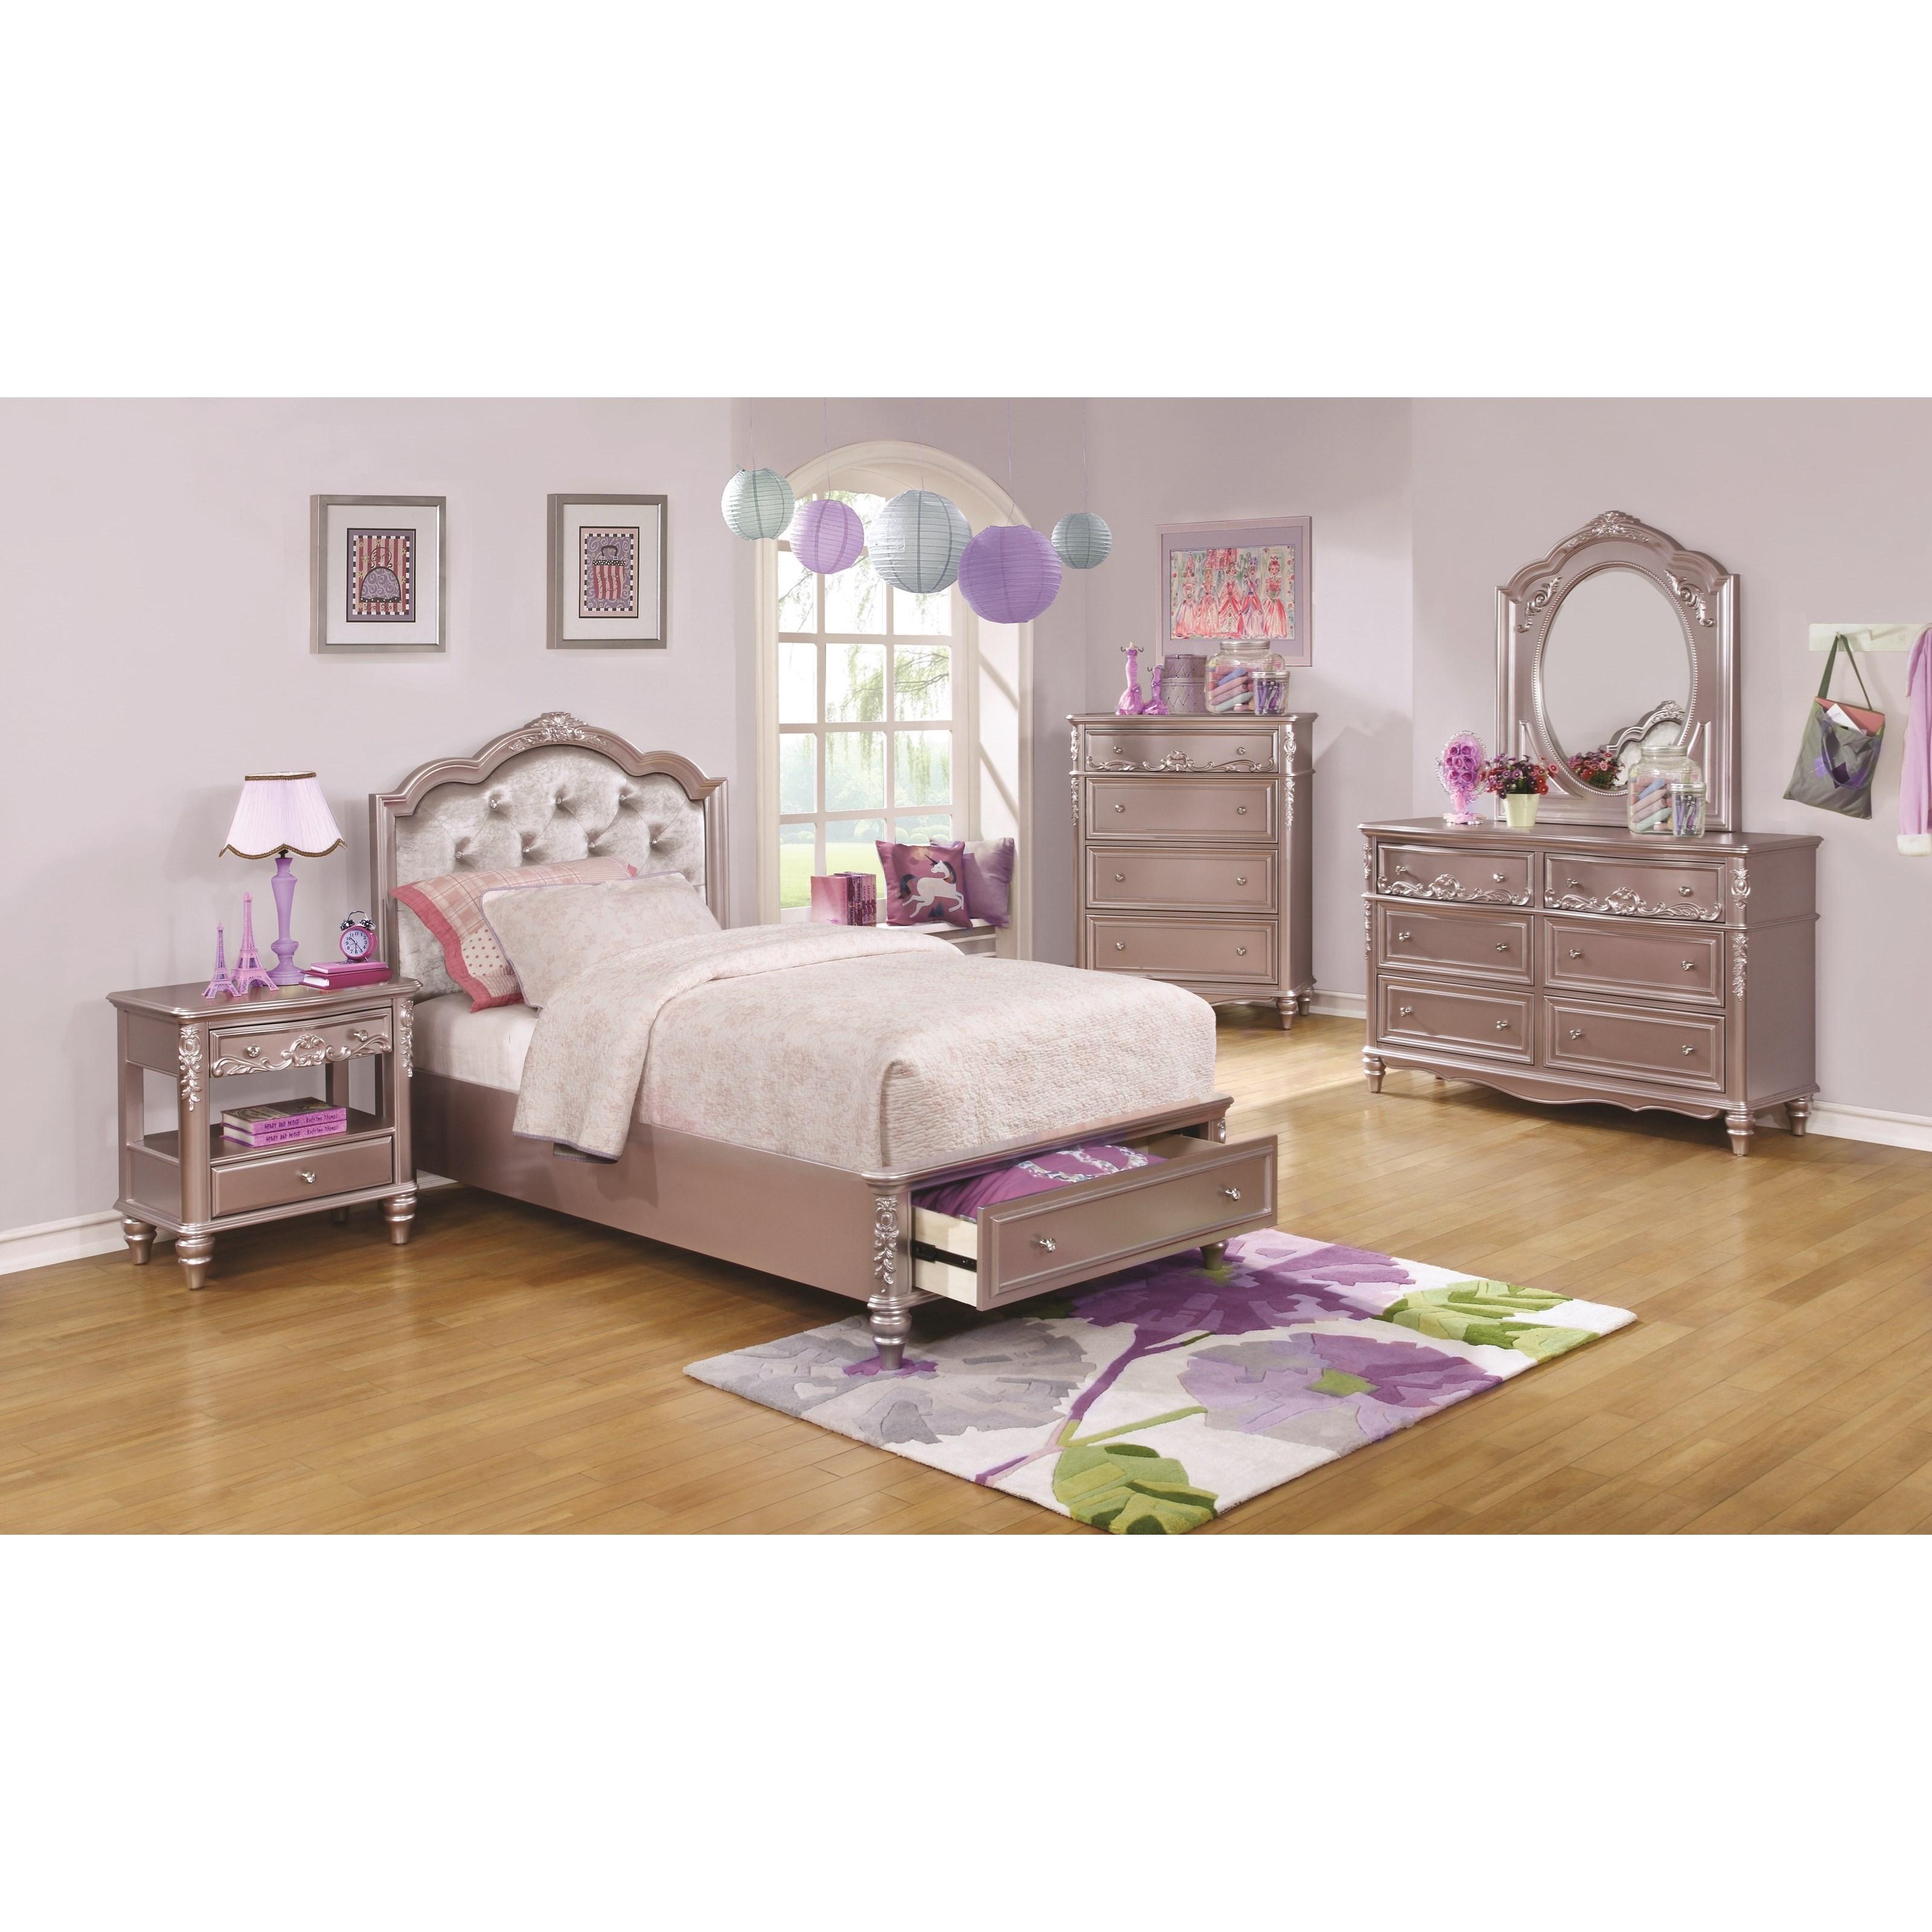 Coaster Caroline Queen Storage Bedroom Group - Item Number: 40089 Q Bedroom Group 2